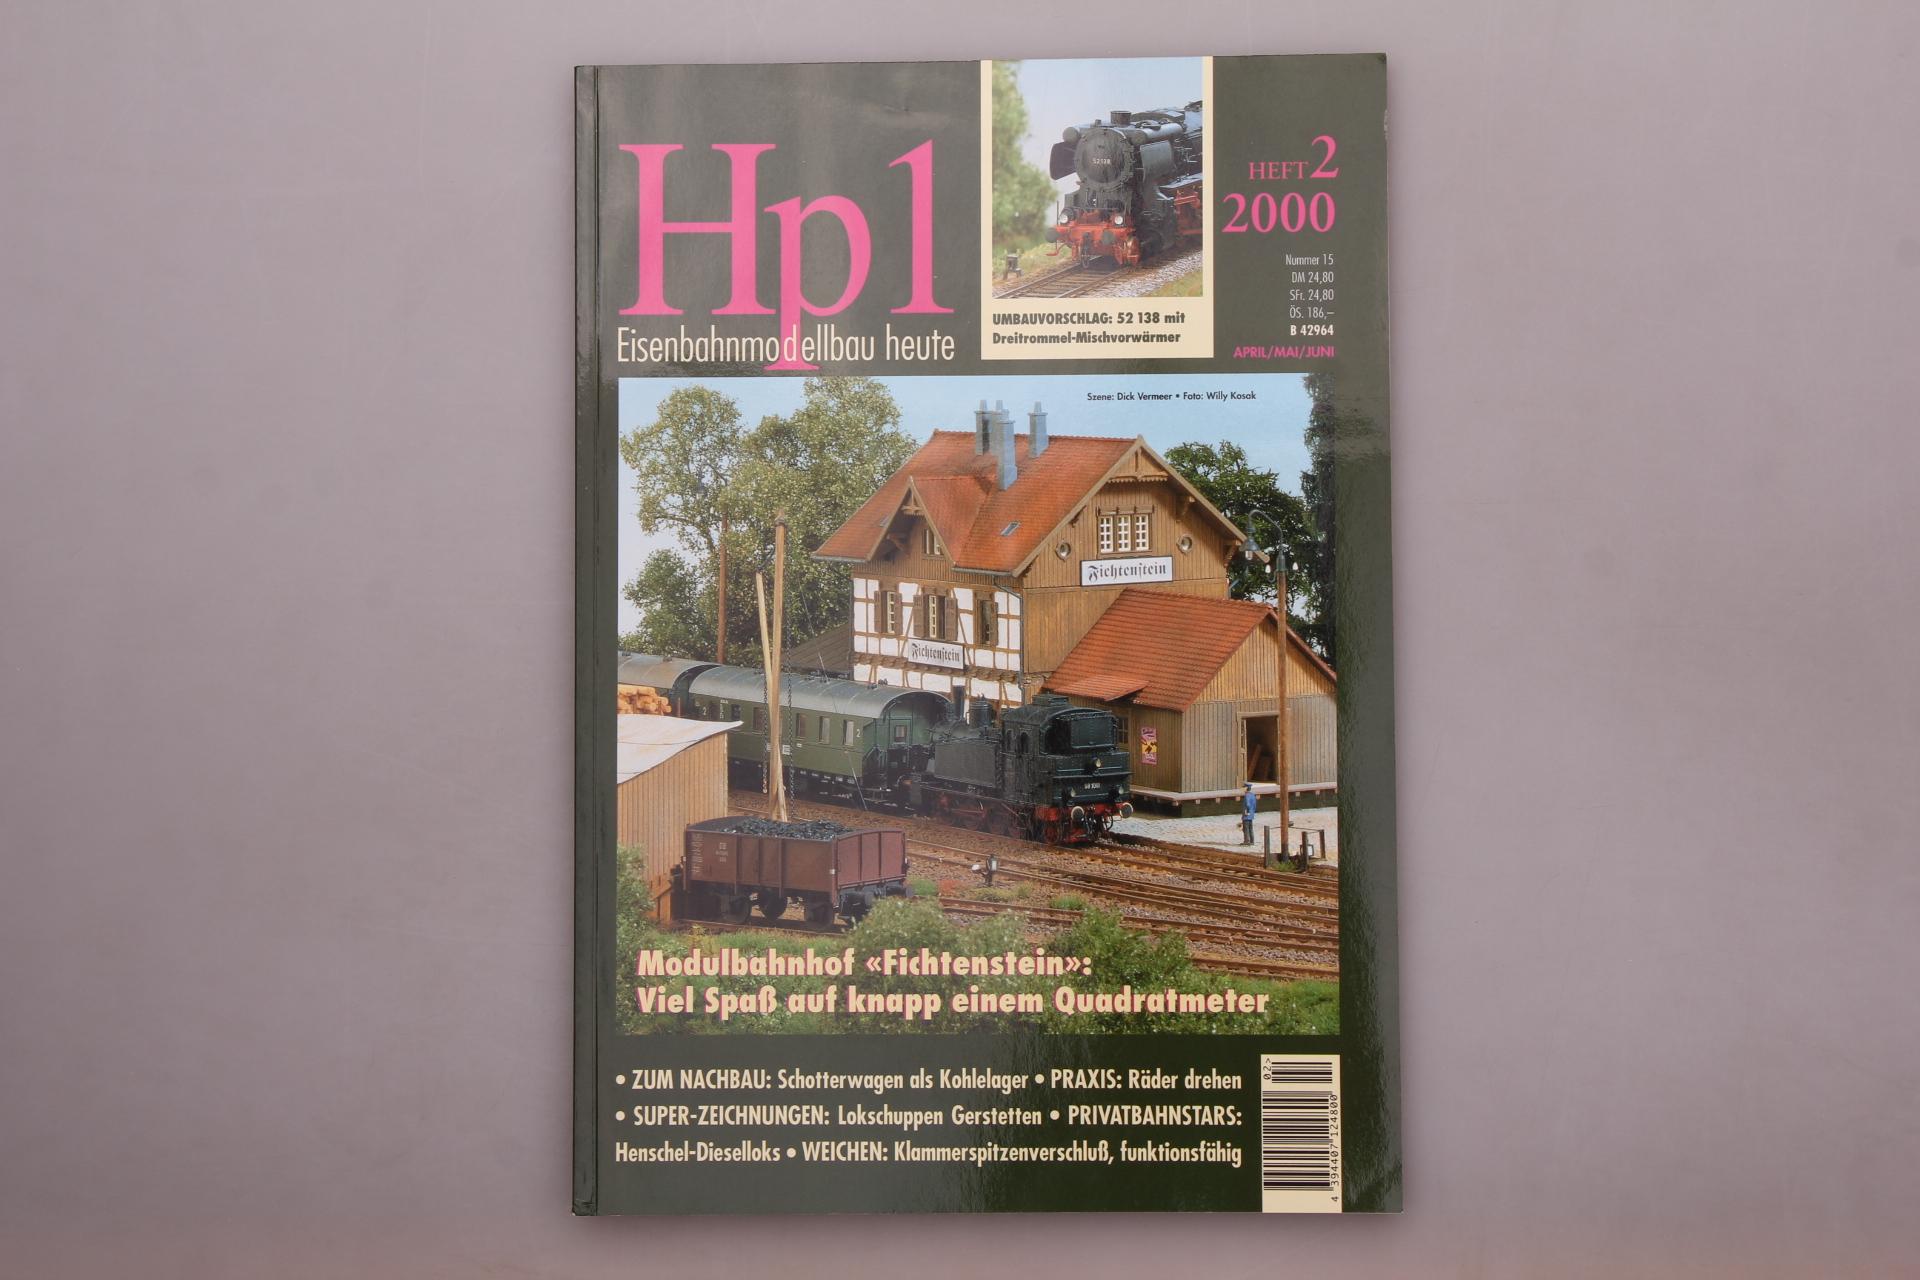 HP 1 EISENBAHNMODELLBAU HEUTE HEFT 2/2000